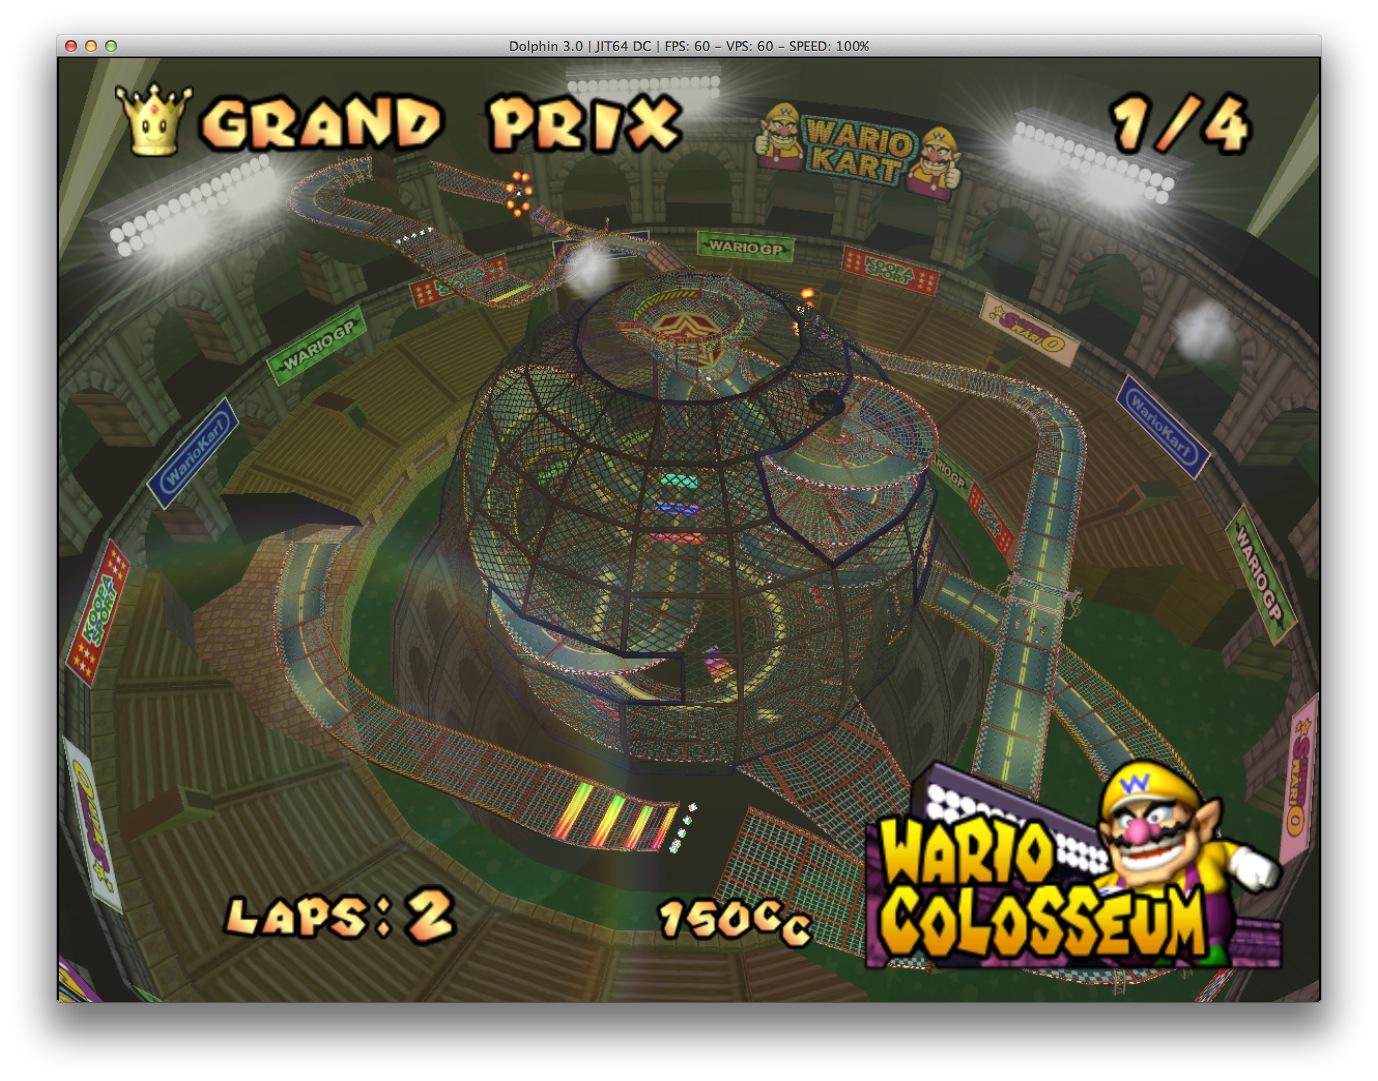 colosseum kart Wario Colosseum | Mario Kart Racing Wiki | FANDOM powered by Wikia colosseum kart